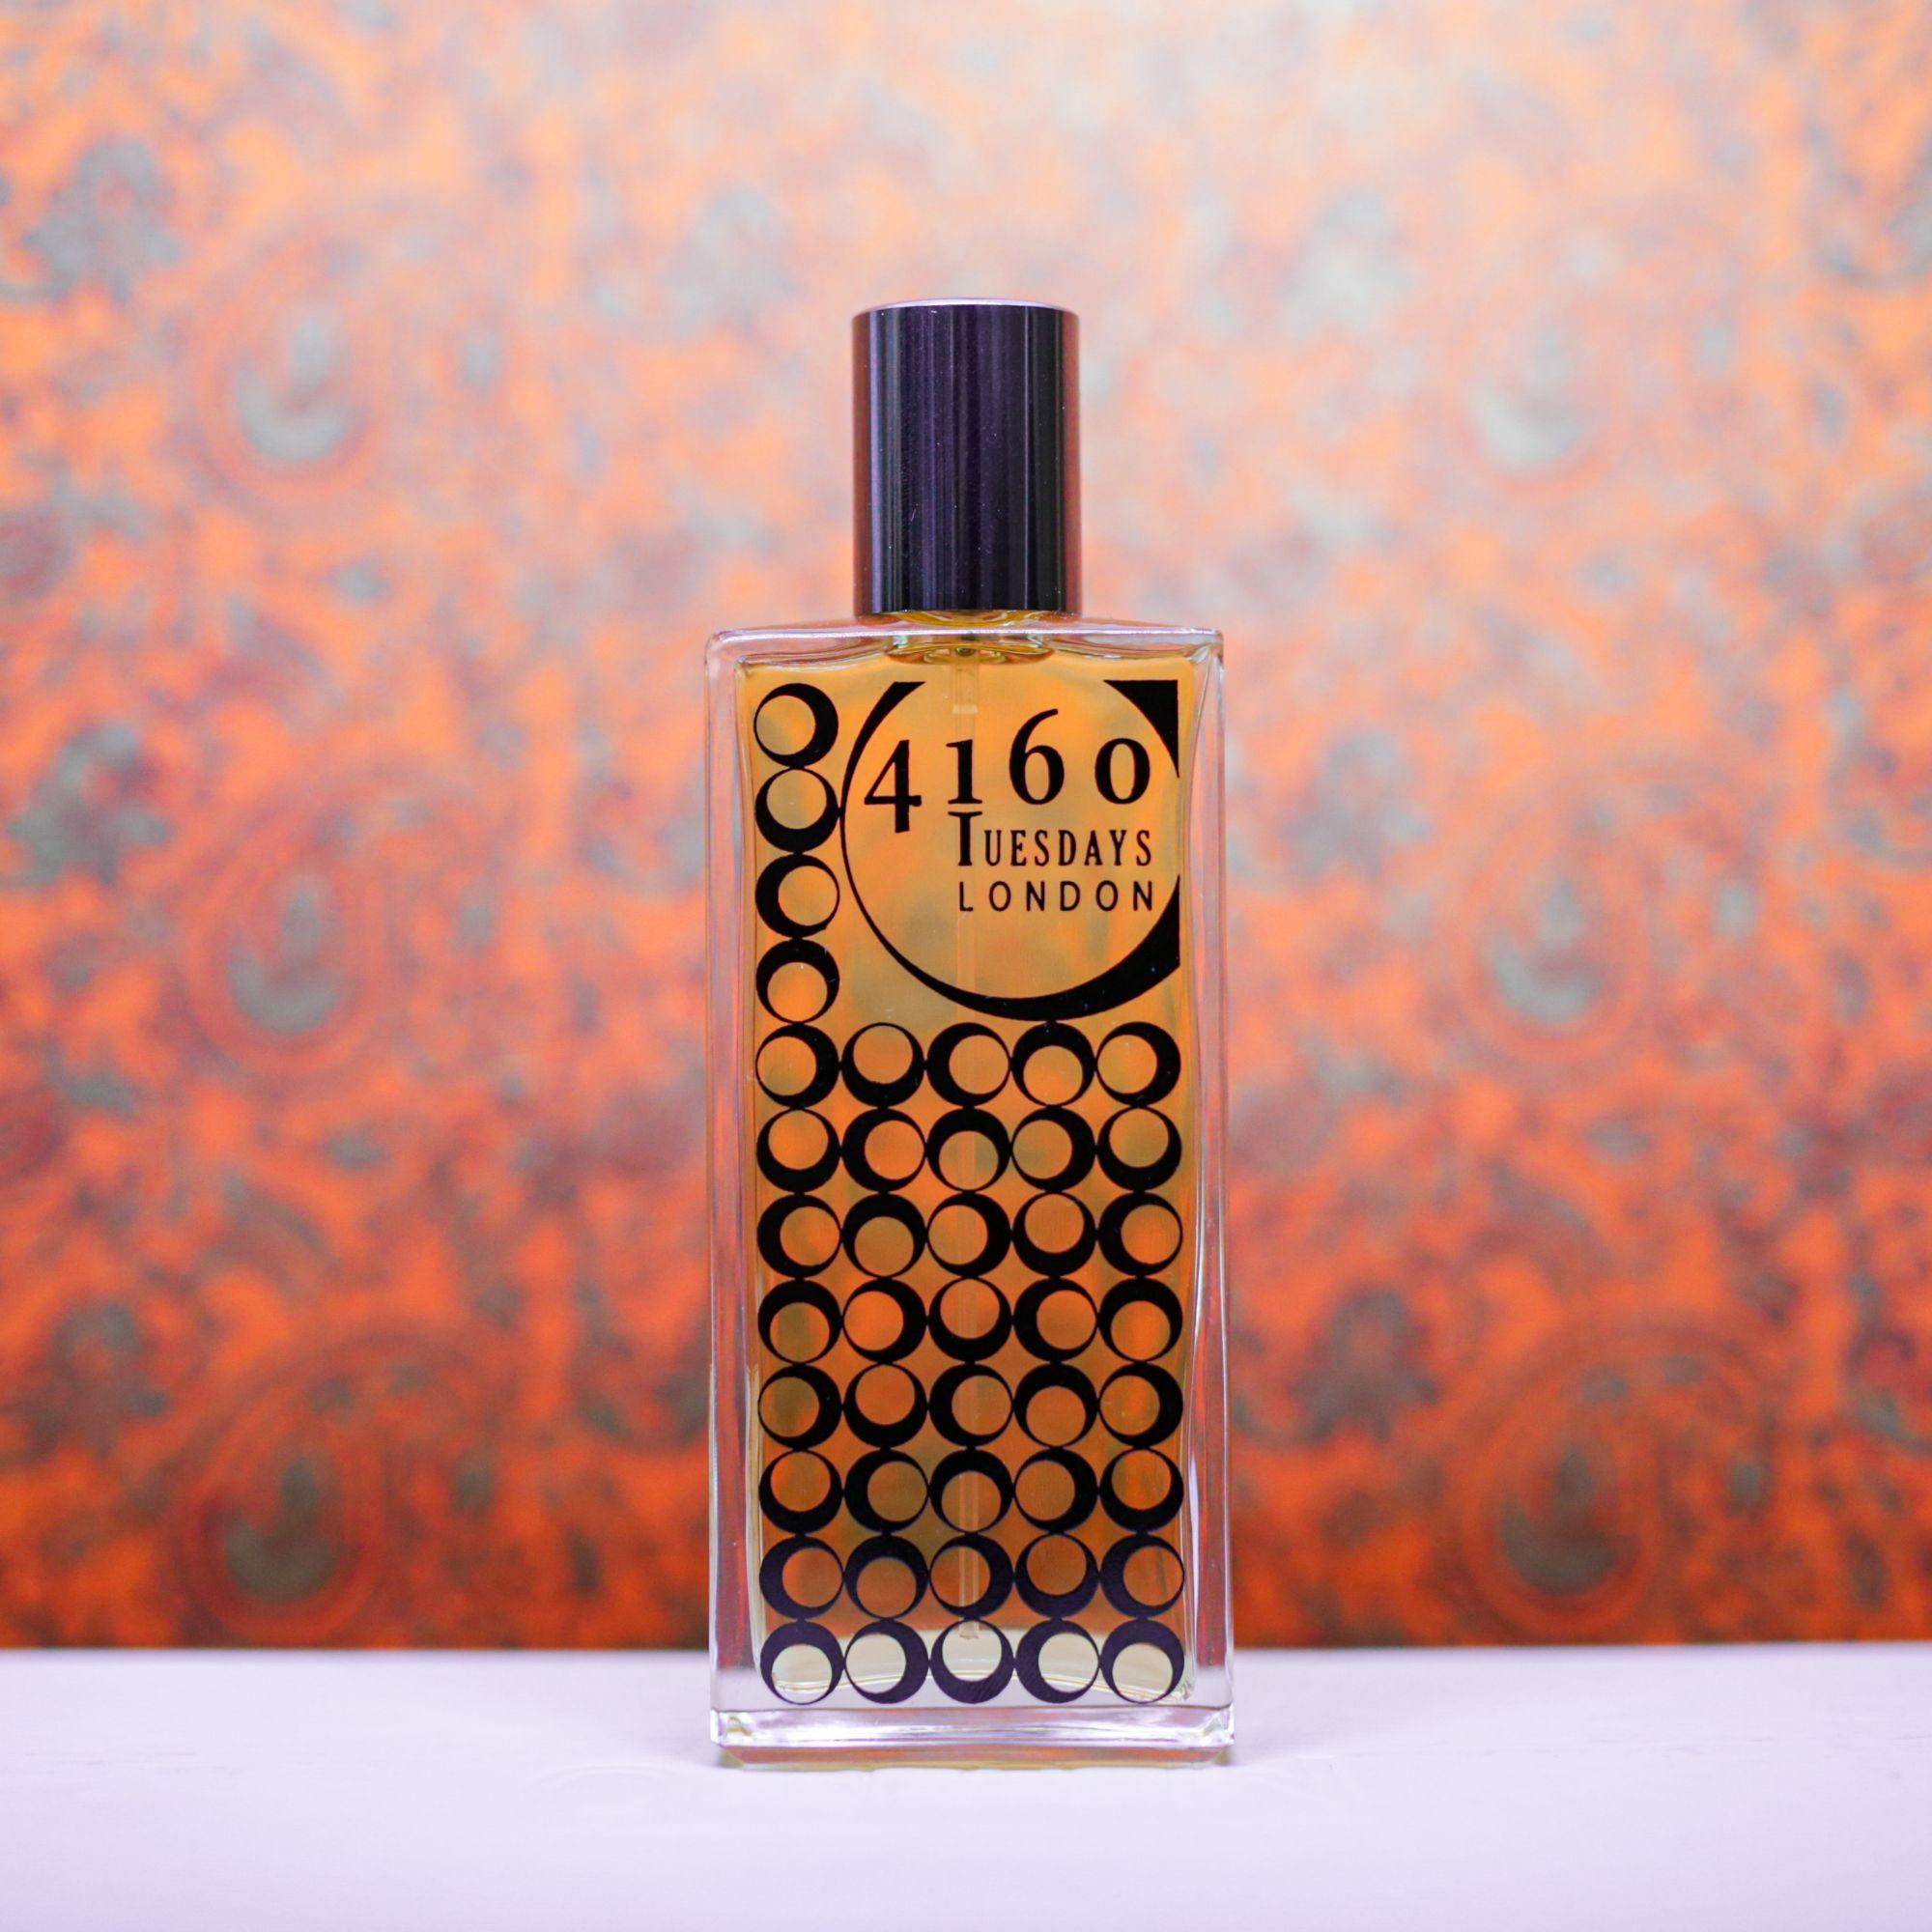 A bottle of 4160 Tuesdays Perfume against a metallic orange backdrop